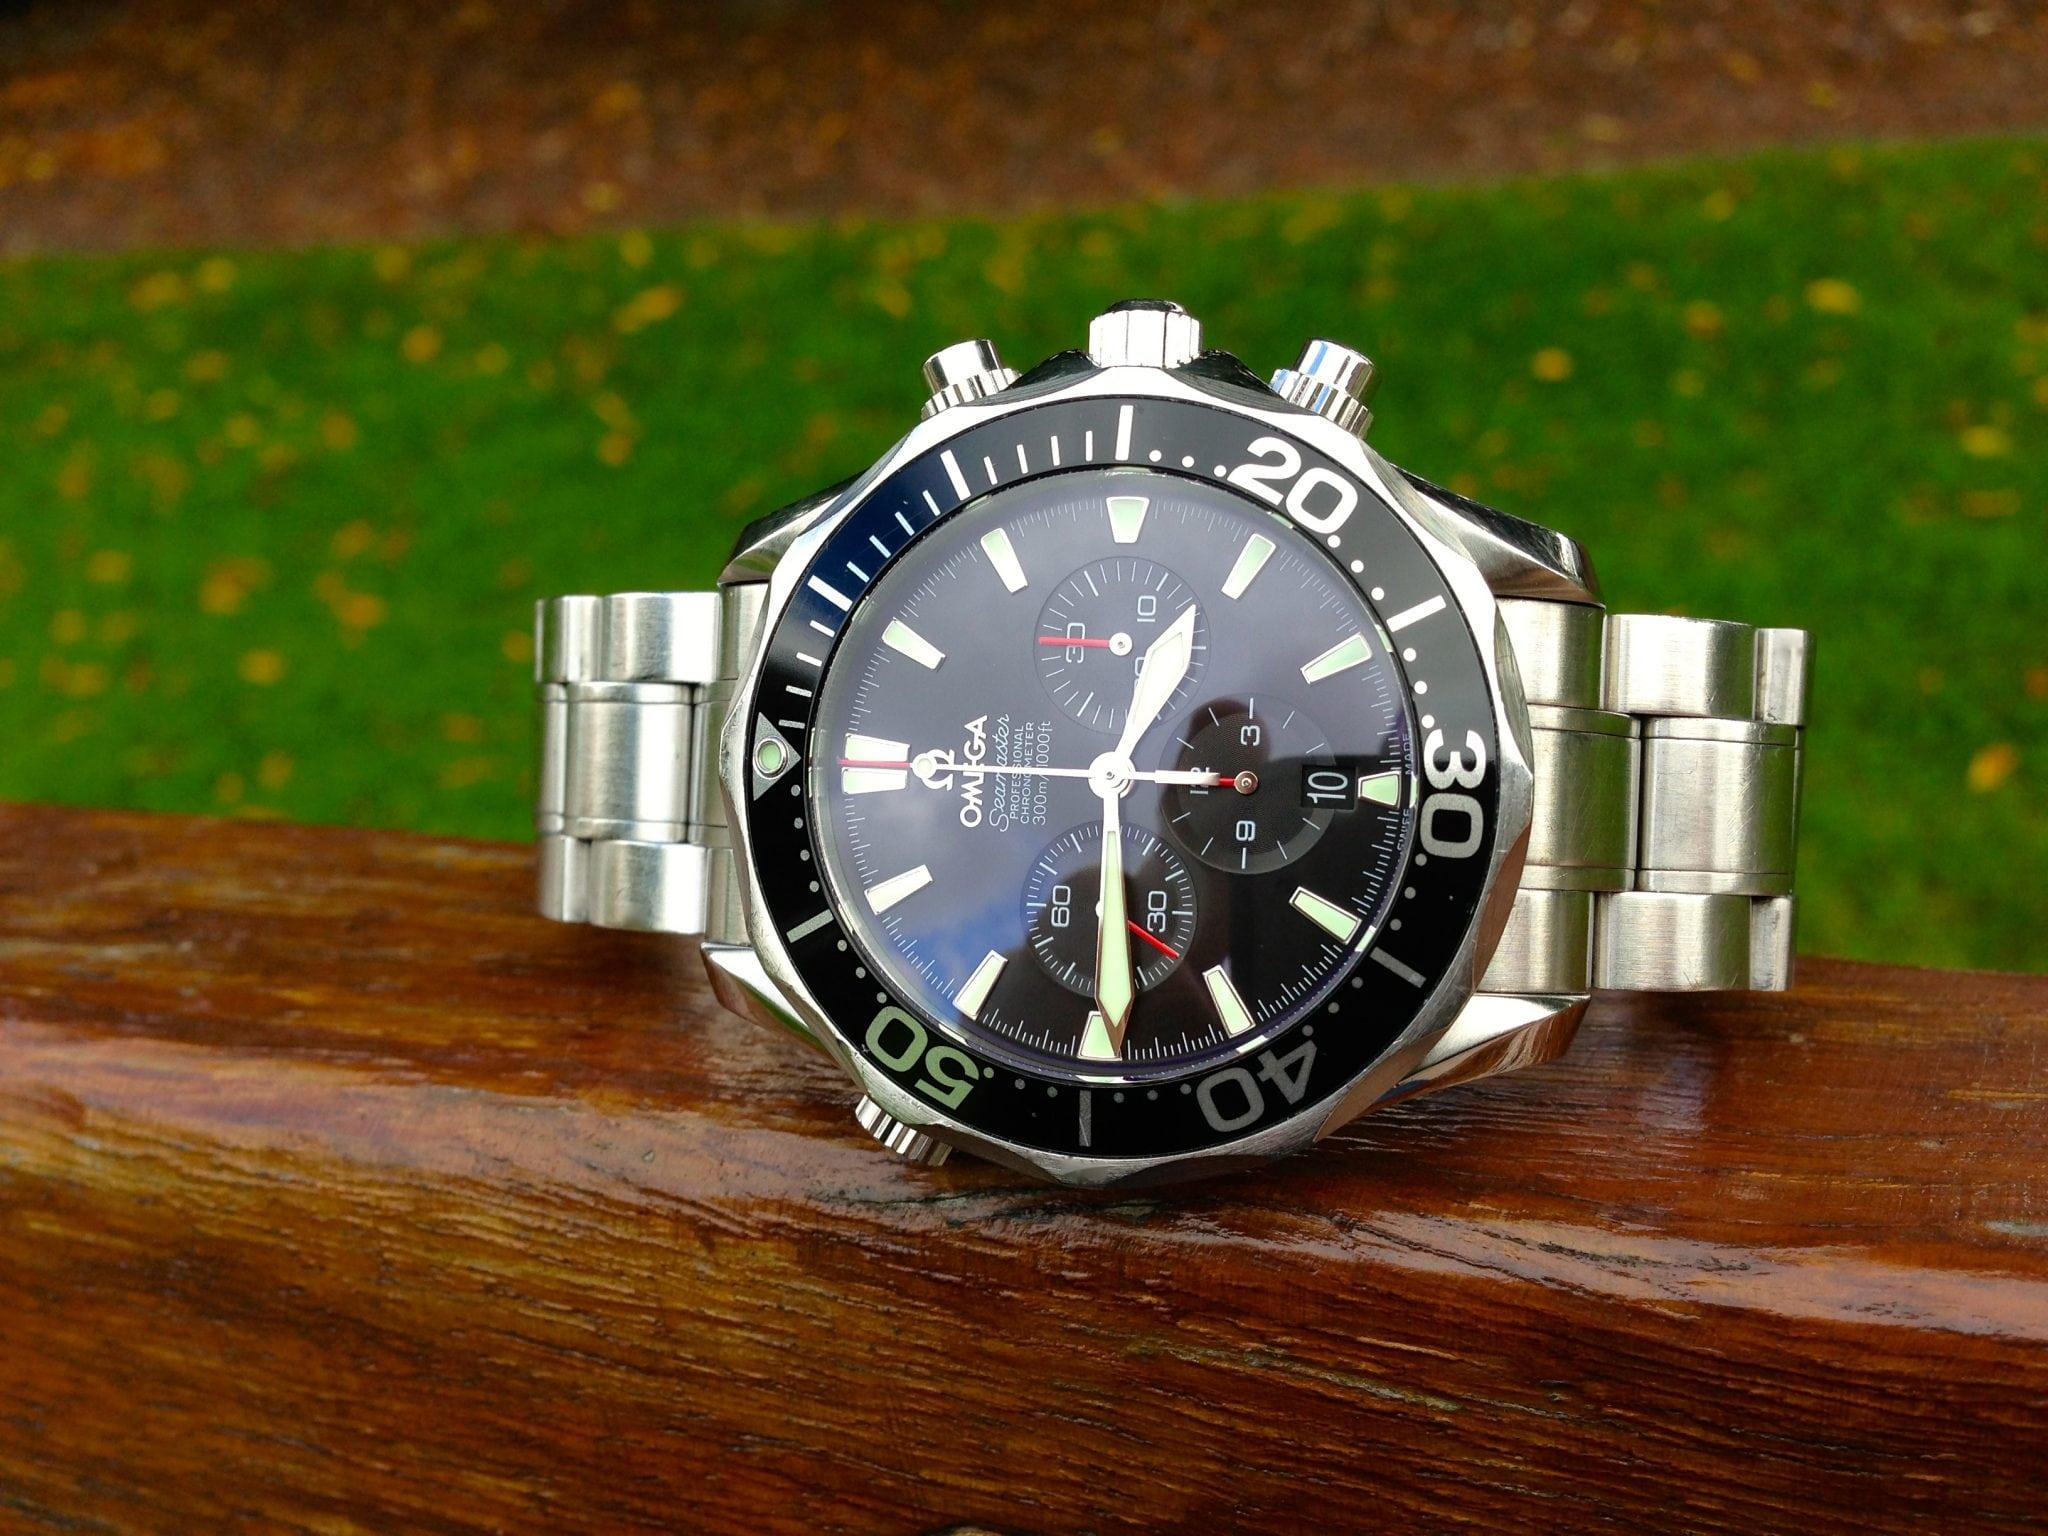 Omega Seamaster 300m Chrono Diver. ref 25945200